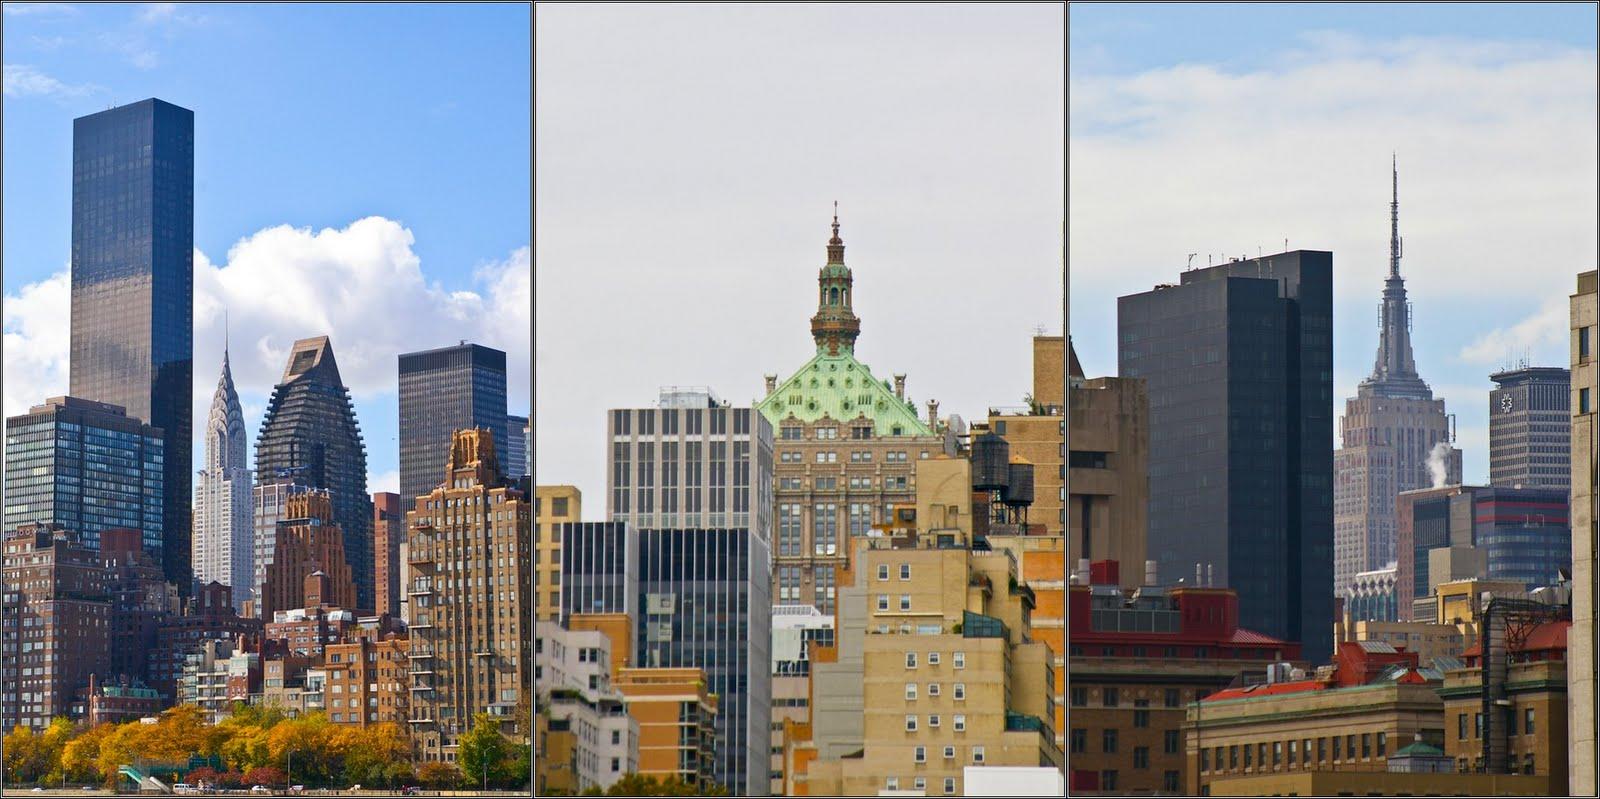 http://2.bp.blogspot.com/_6HI4nECGs-4/SwlfLdI5zYI/AAAAAAAAJDI/Jc4E7-psOcY/s1600/Evry+Daily+Photo+-+NYC+2009+-+Roosevelt+Island+-+Skyline+2.jpg